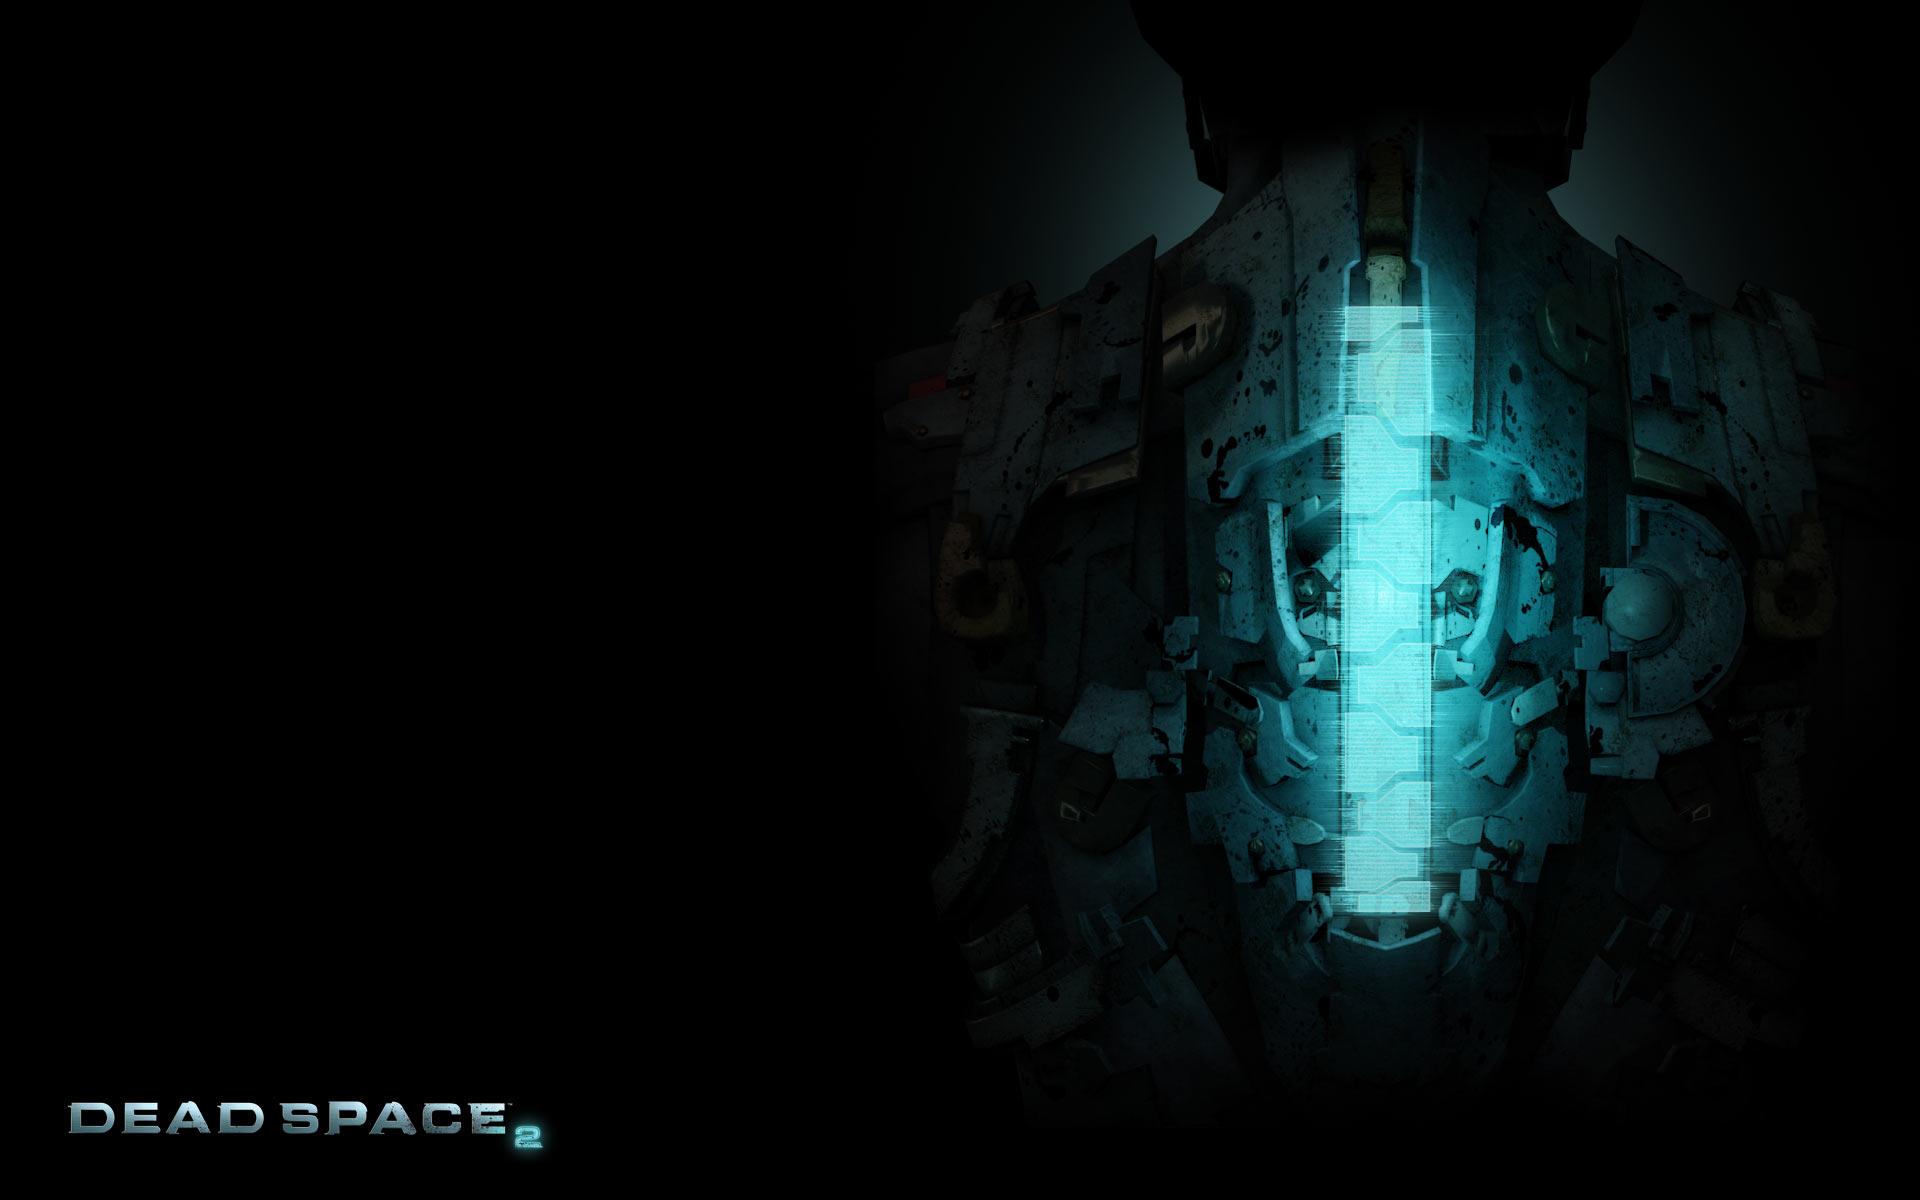 Dead Space Wallpapers - HD Desktop Wallpapers